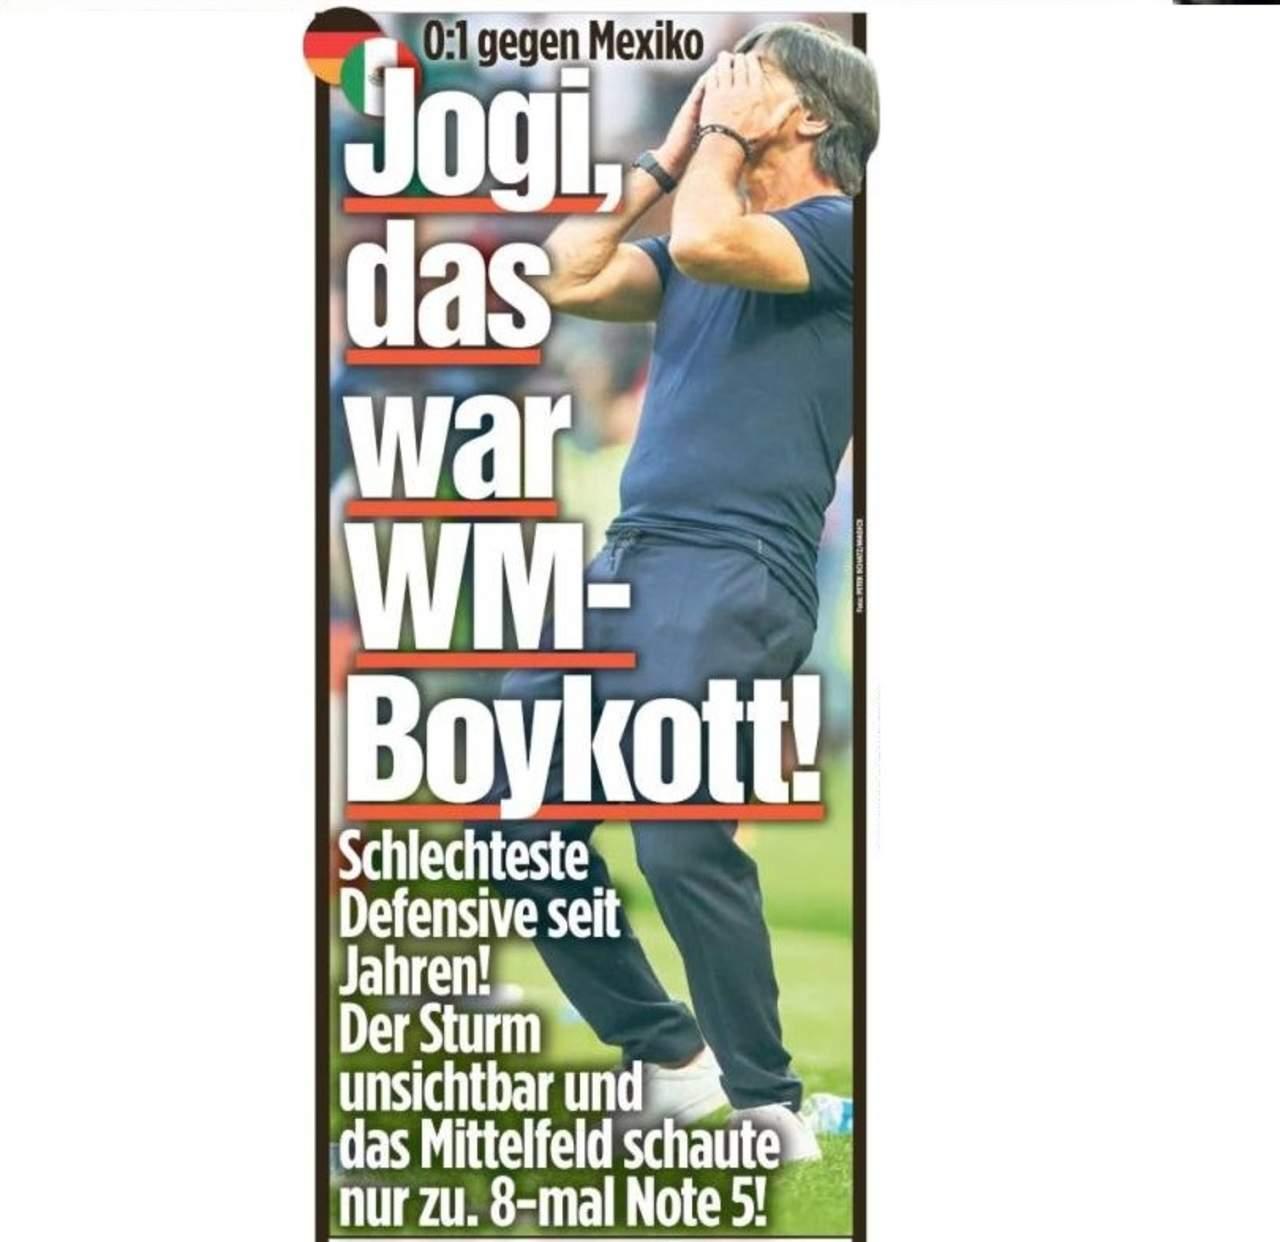 Prensa alemana critica la derrota contra México